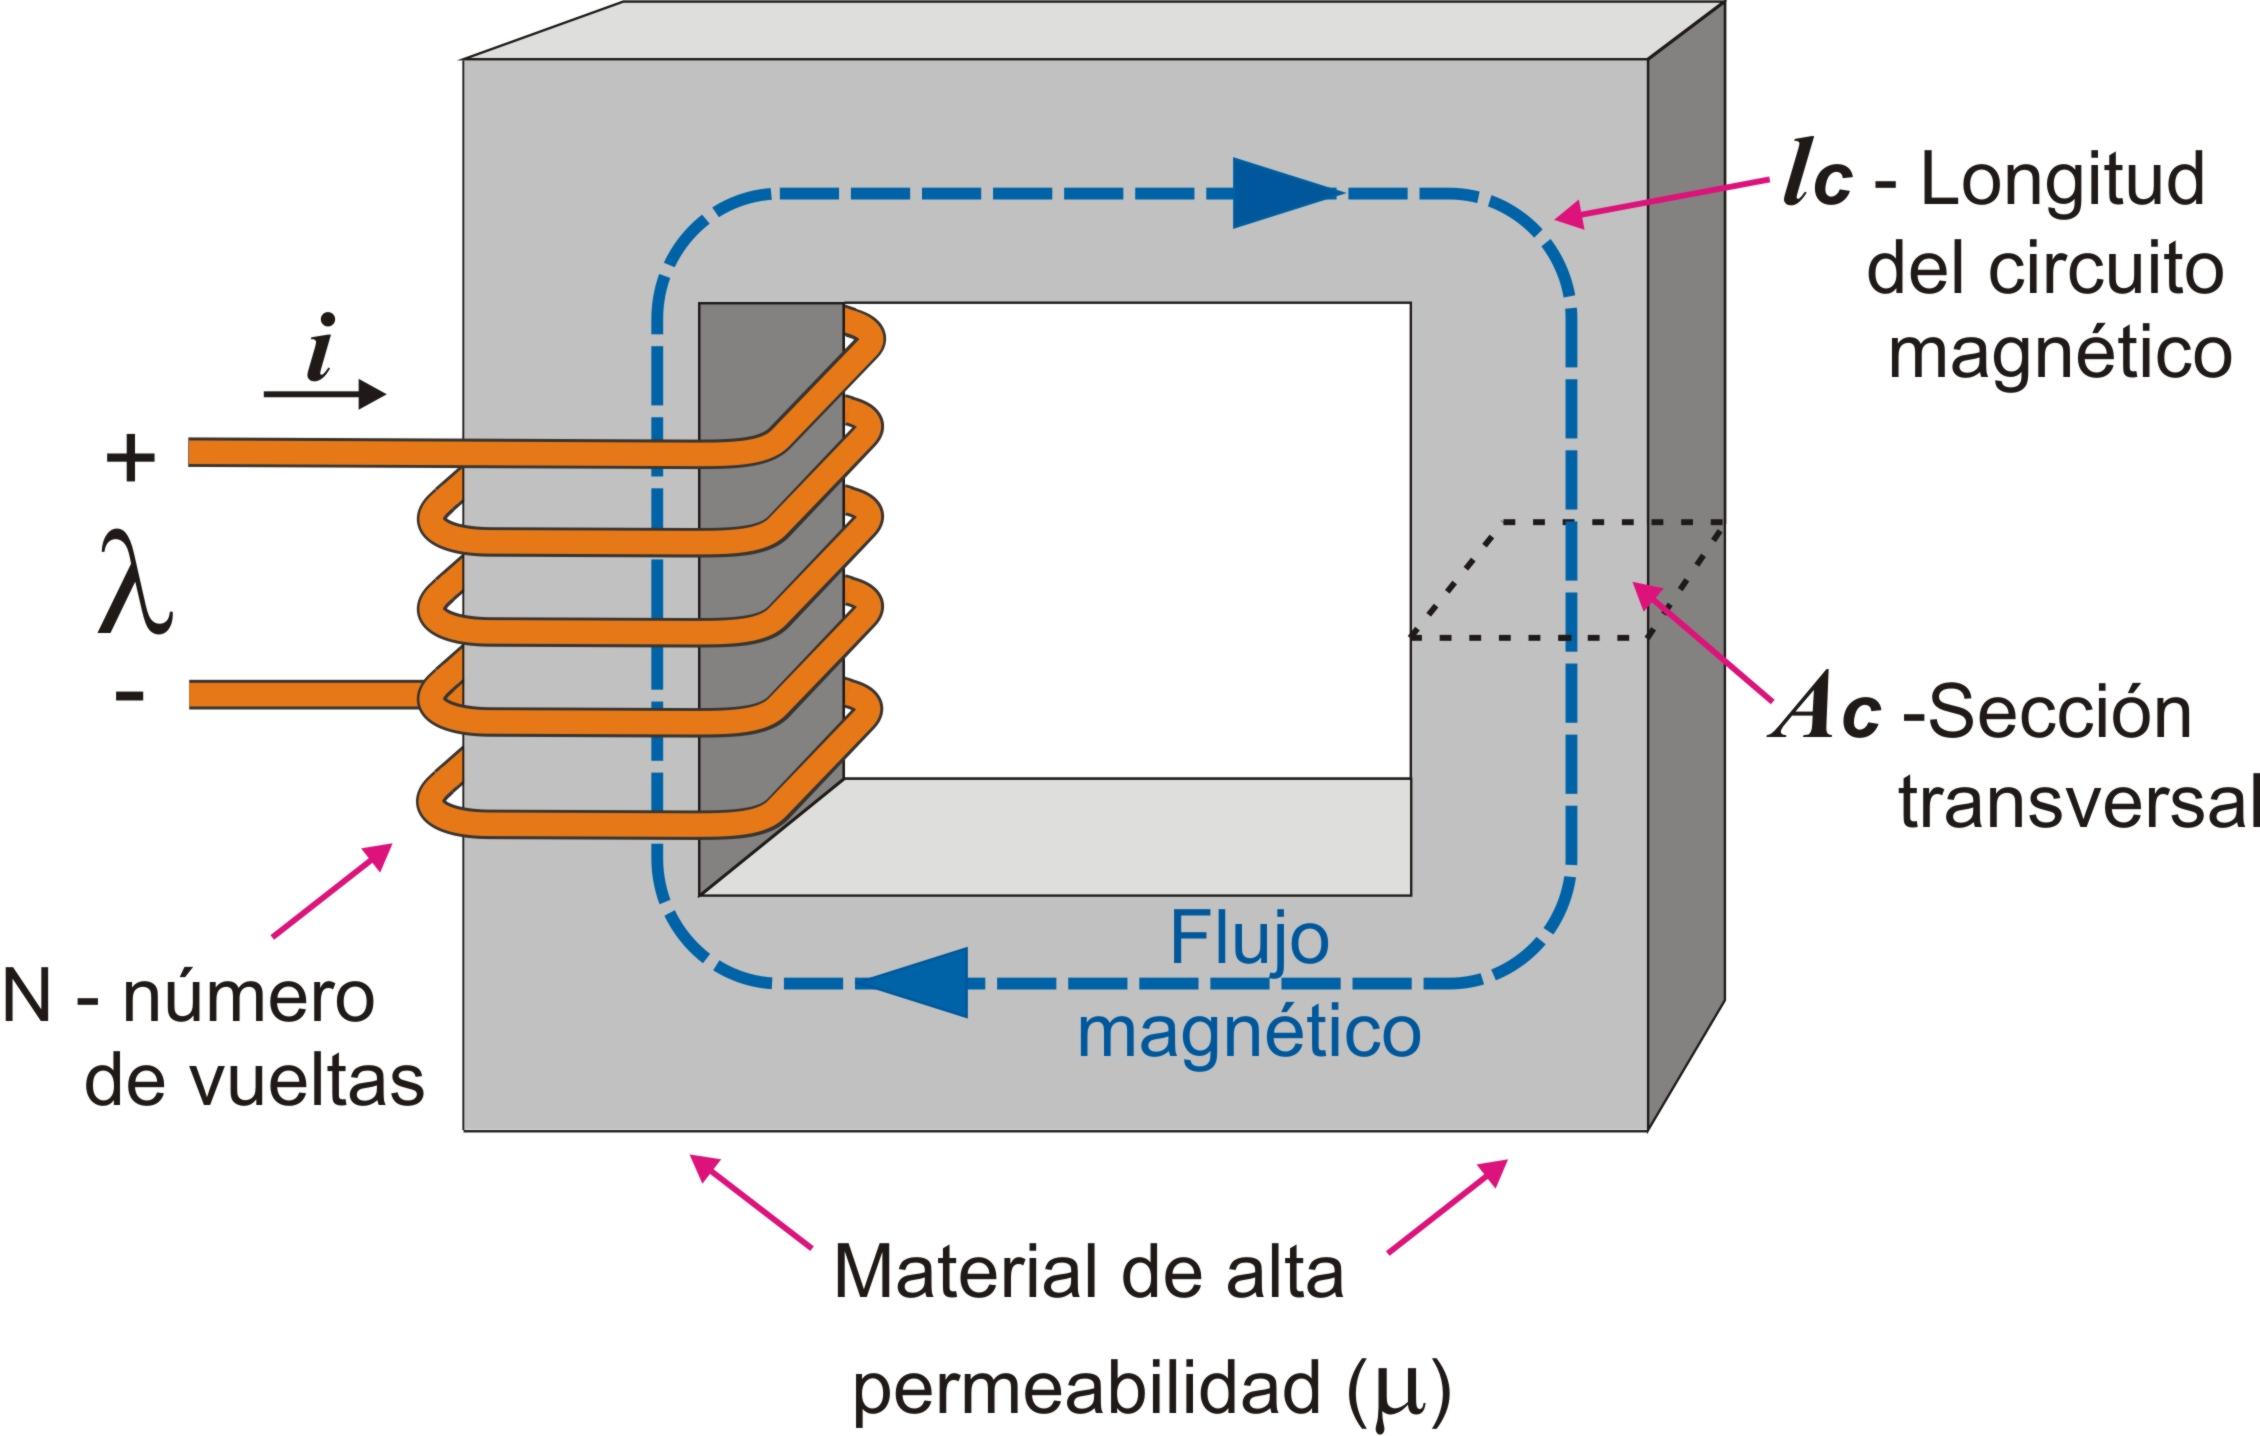 Circuito Simples : File circuito magnetico simple detalle g wikimedia commons